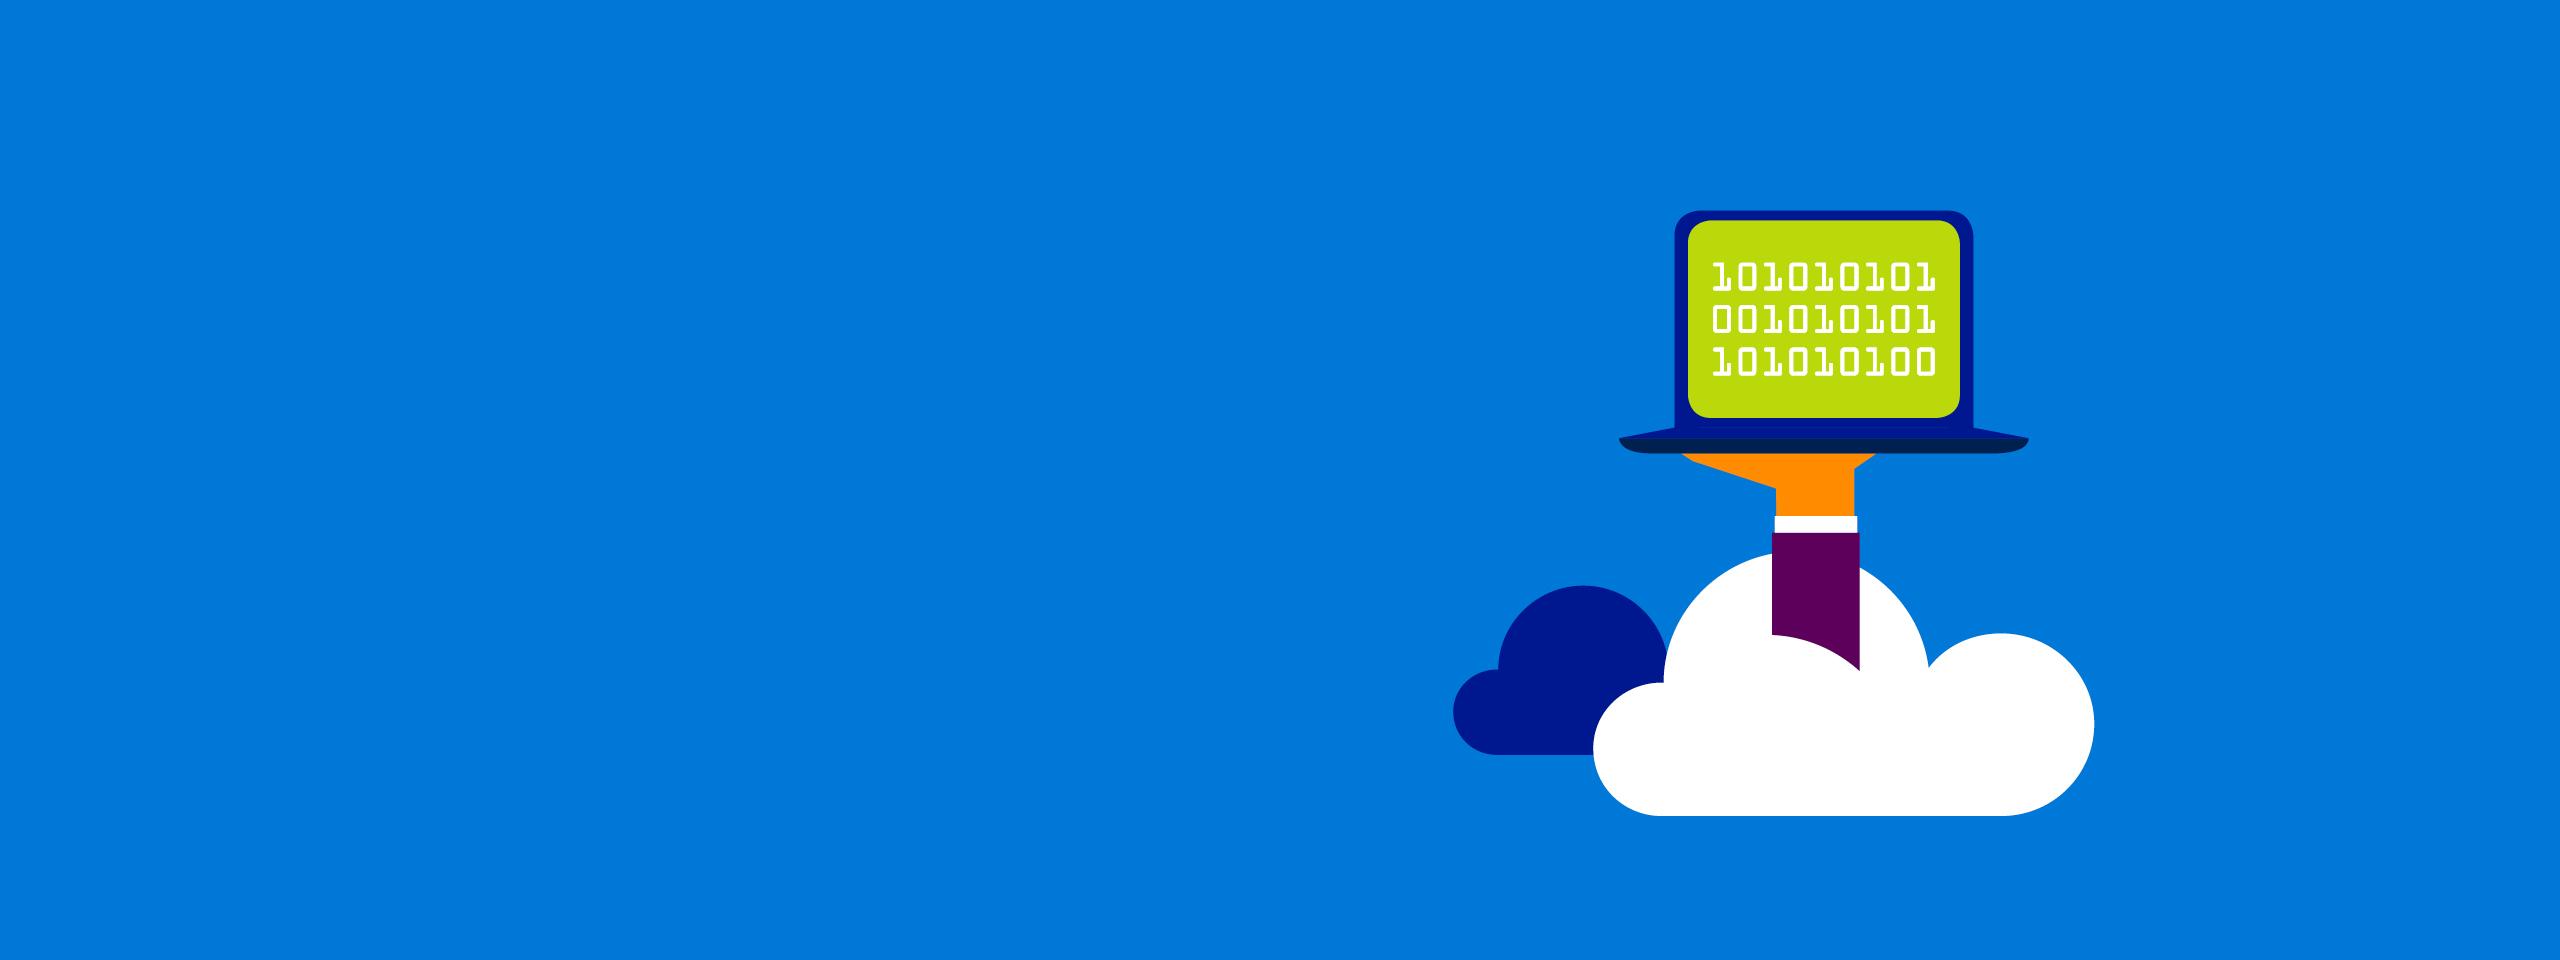 Развертываем Parallels RAS в Microsoft Azure за полчаса